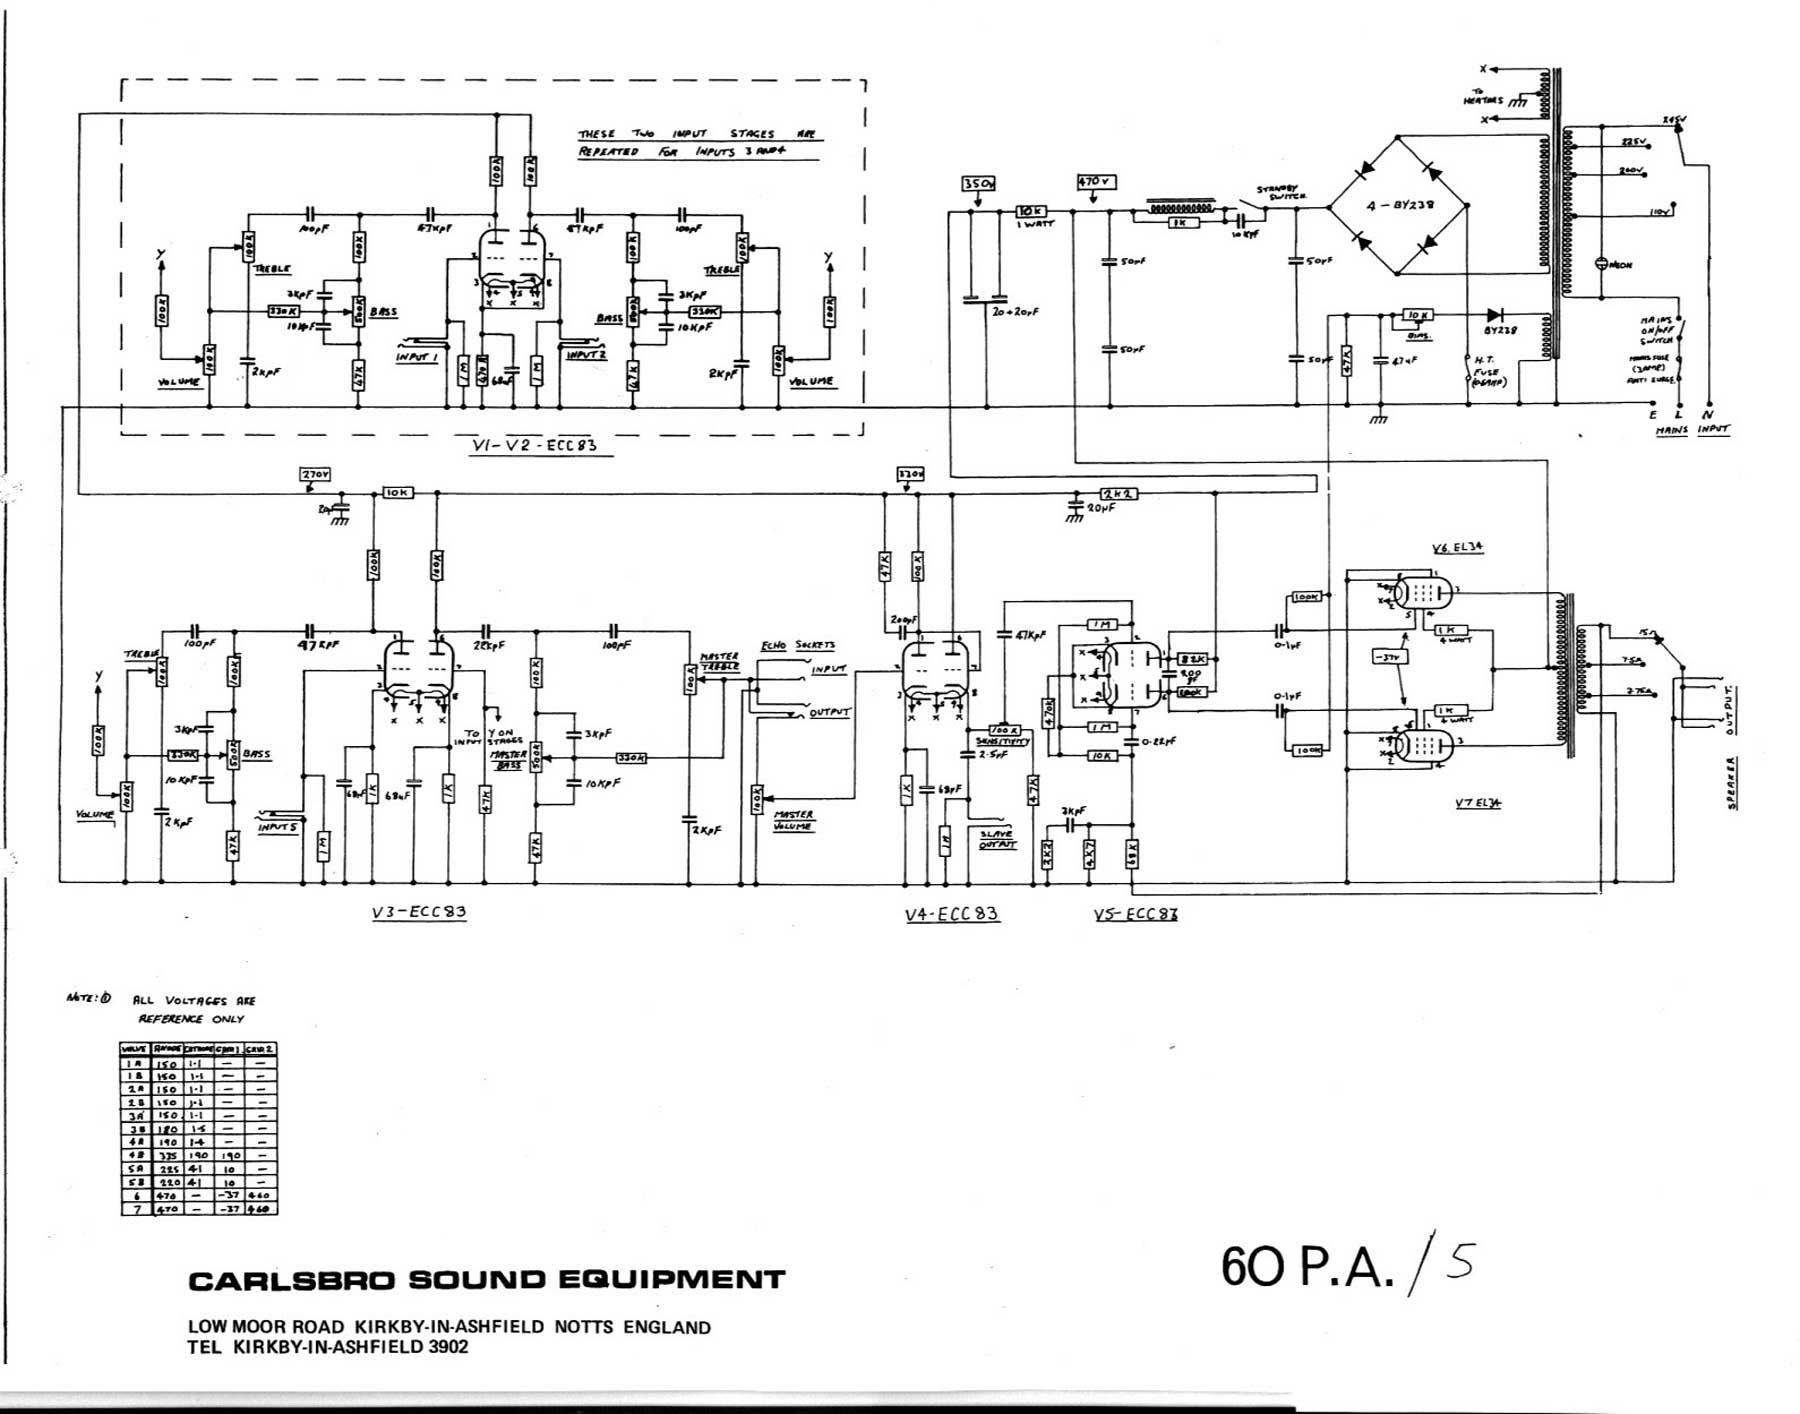 01 Yamaha Big Bear Wiring Diagram Carlsbro 60 Pa 5 Amp Schematic